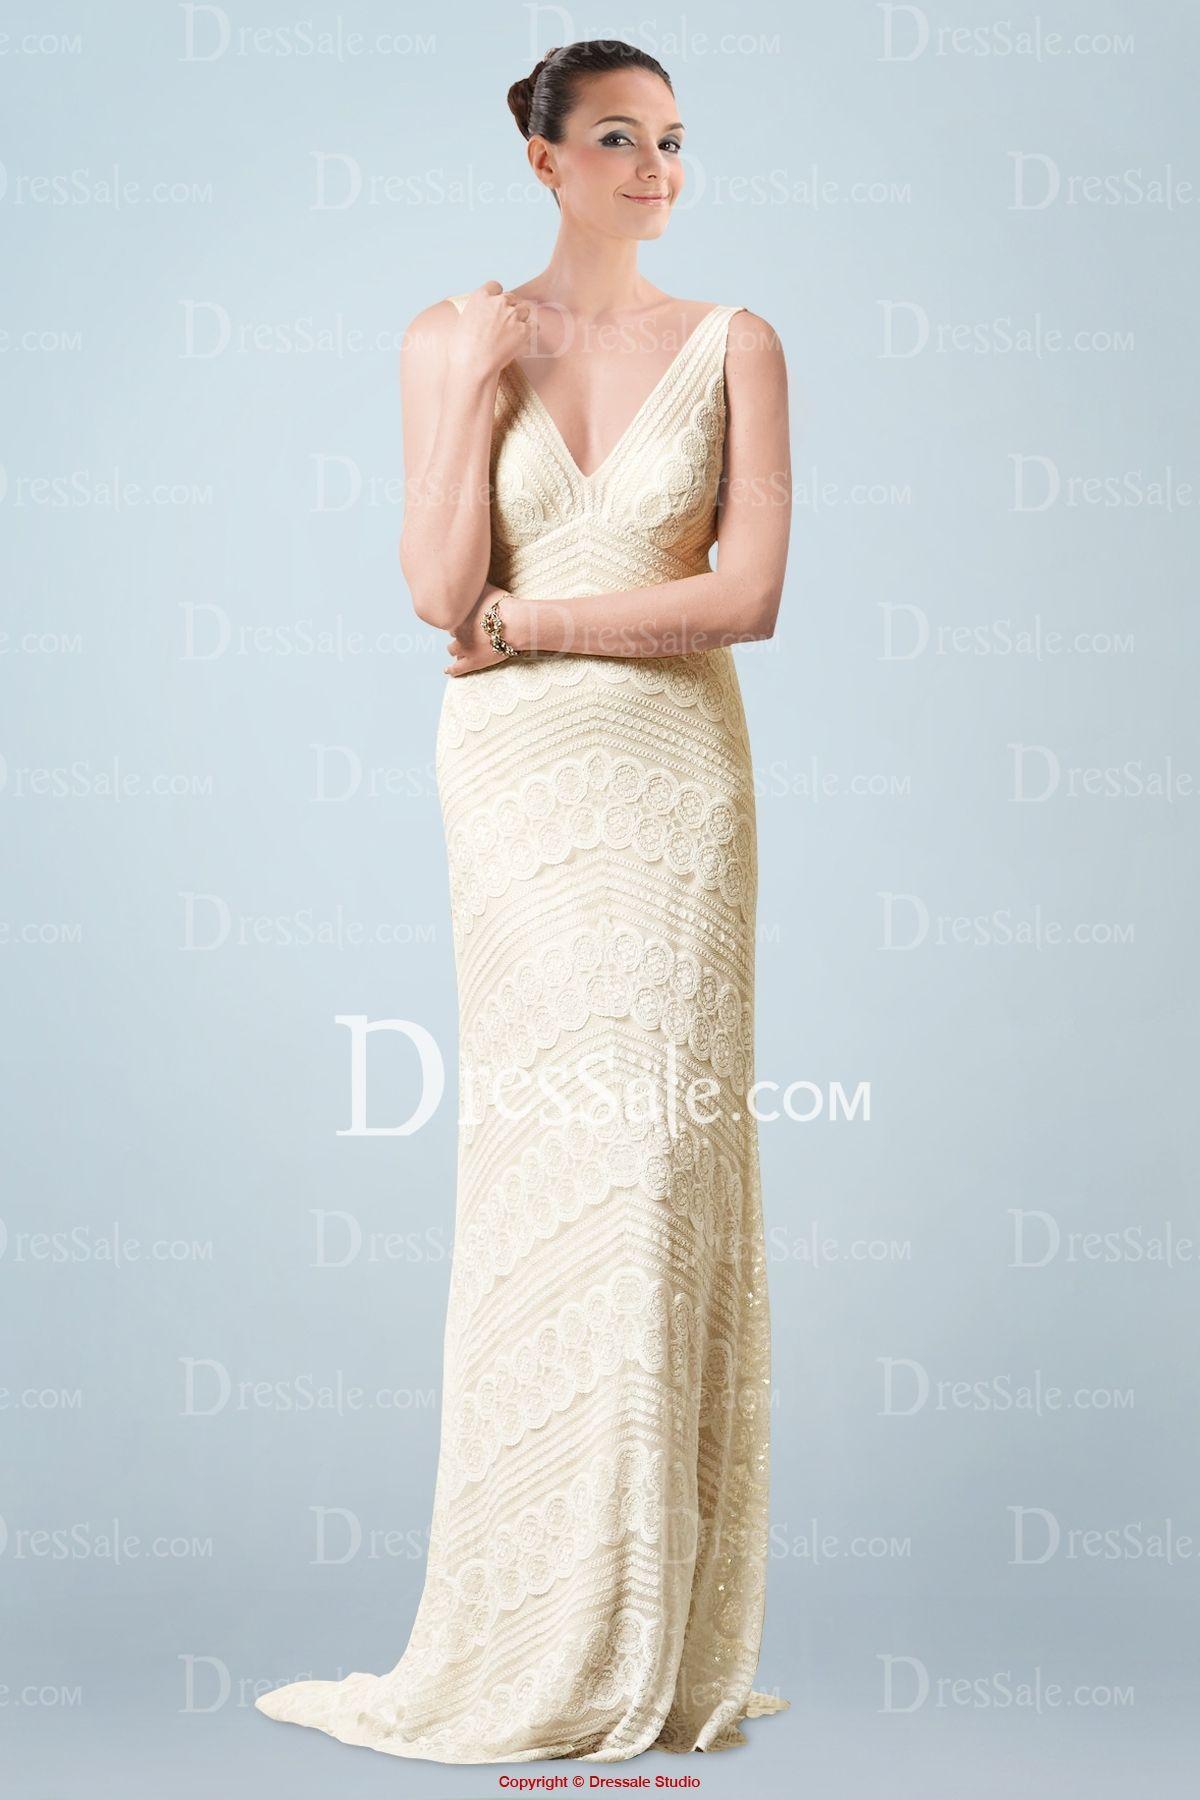 Metallic wedding dress   New Style Metallic Vneck Sleeveless Sheath Wedding Dress in